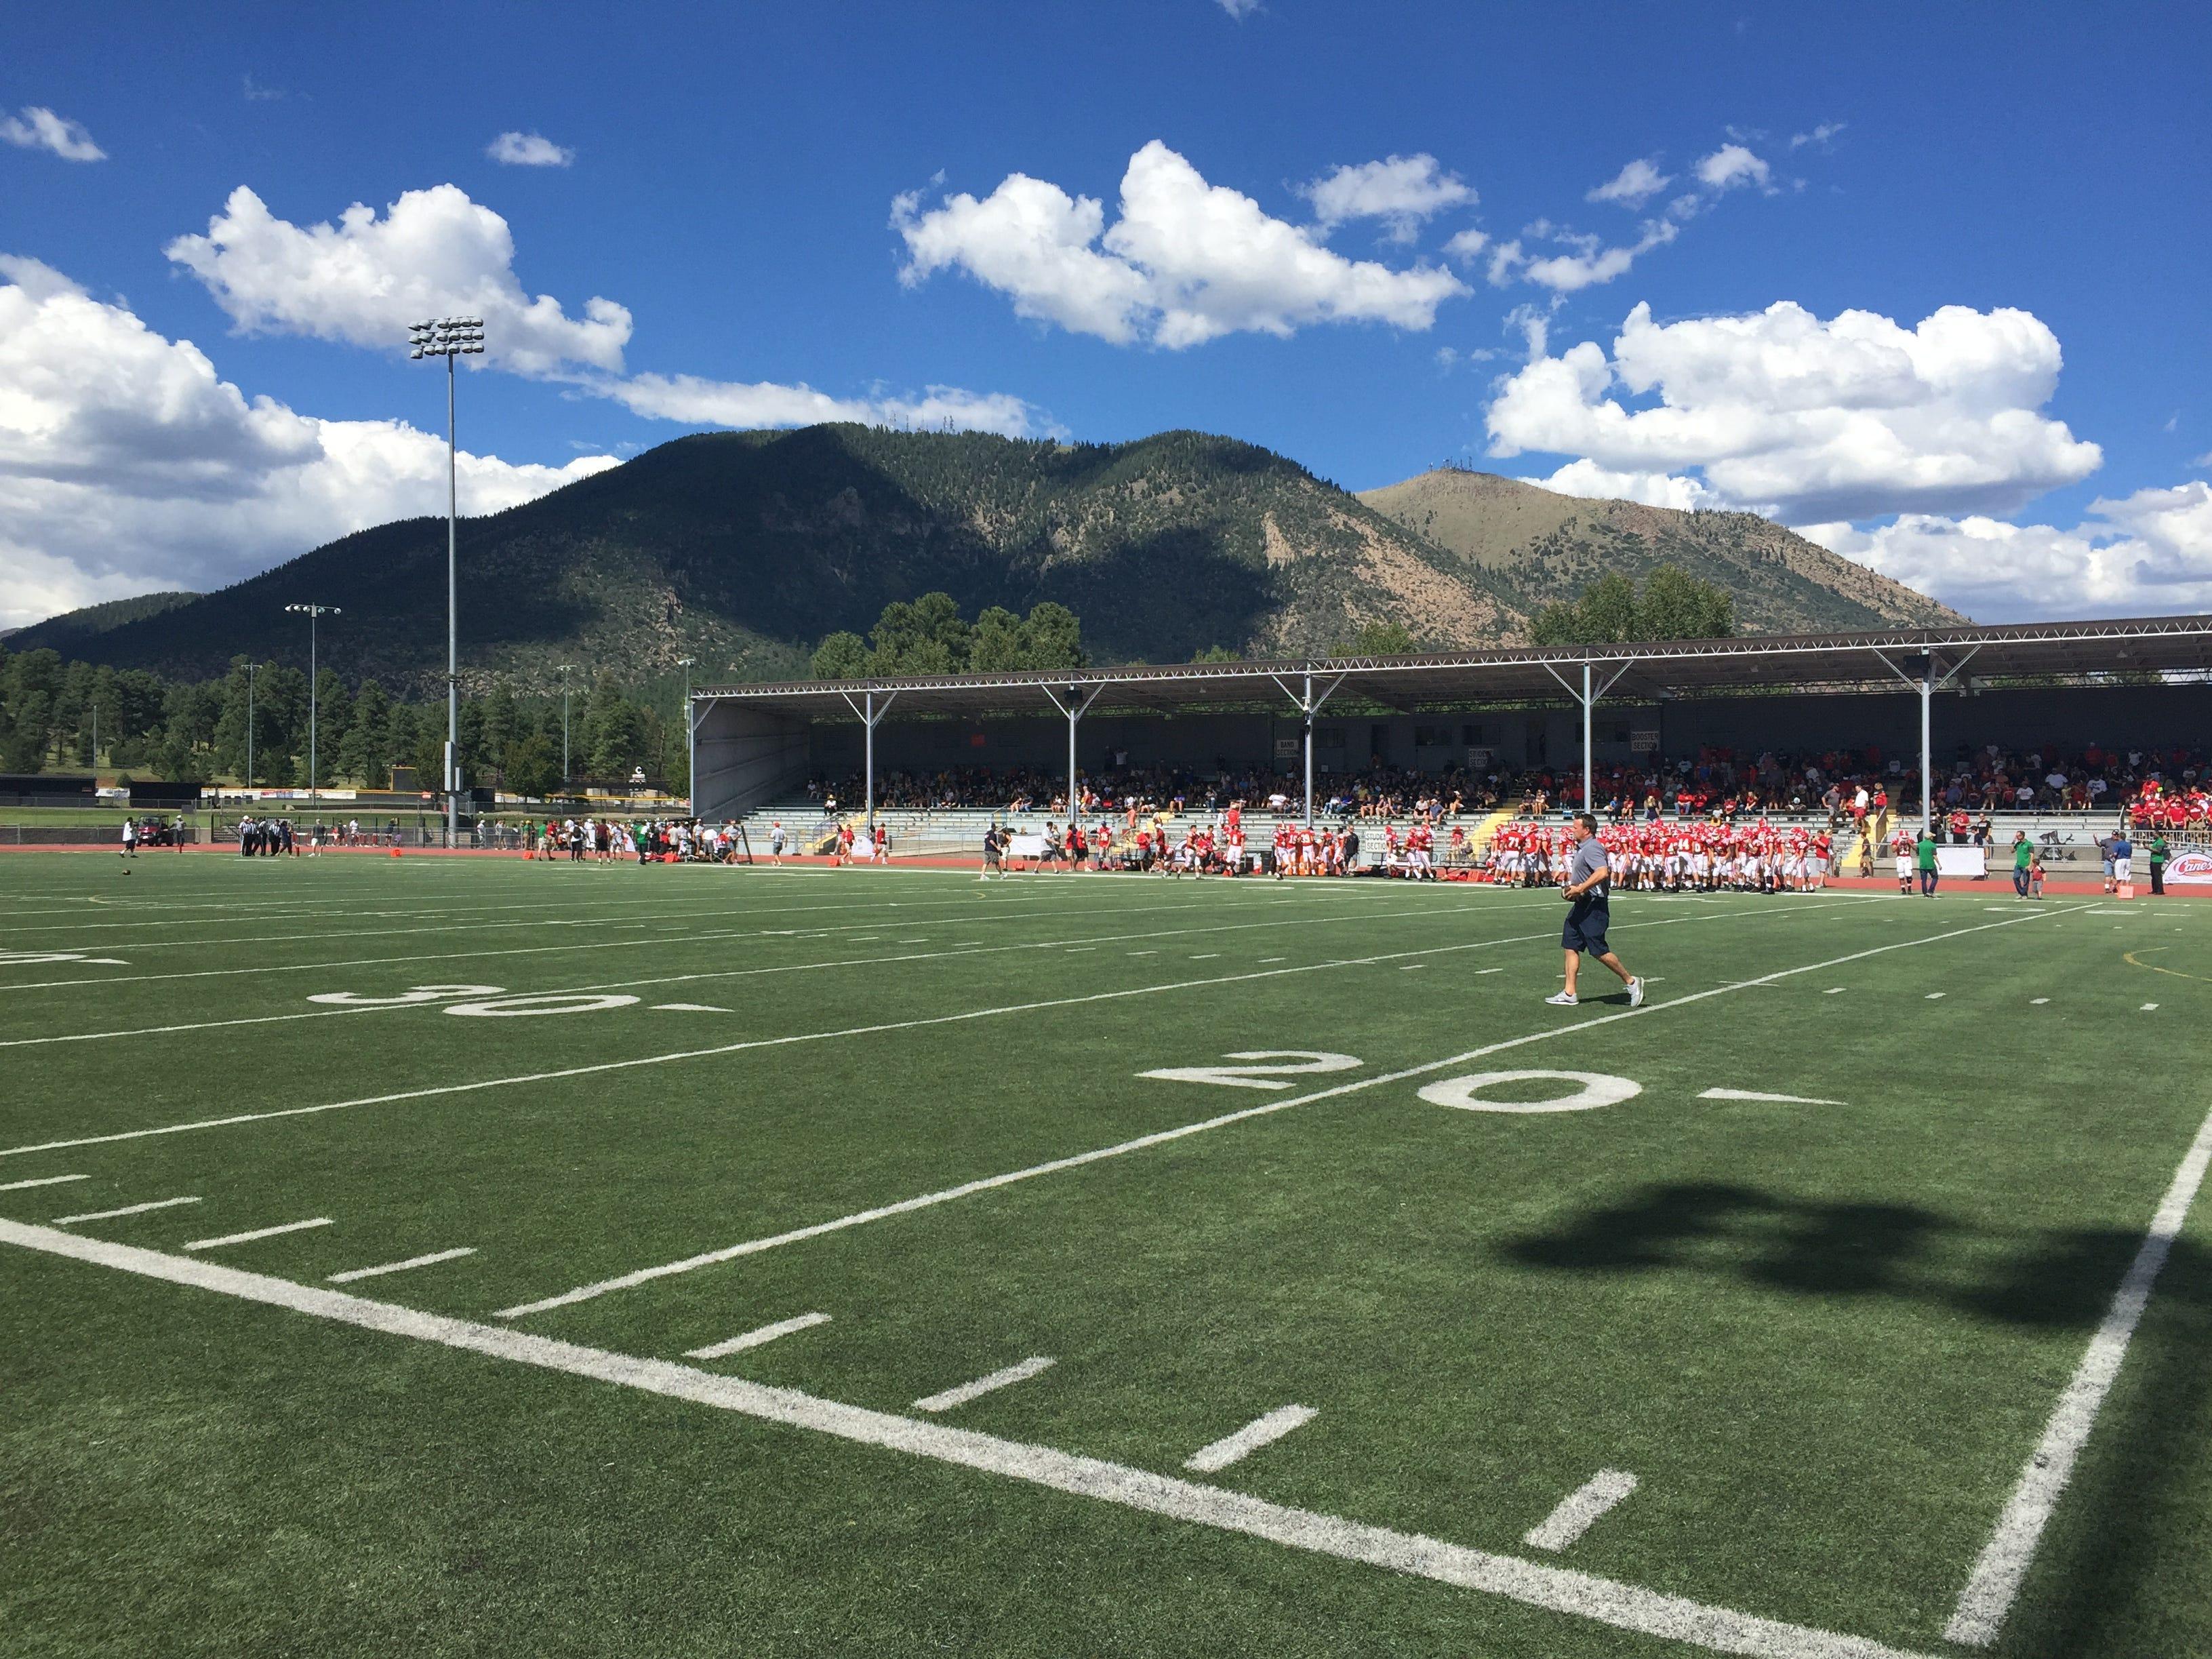 Flagstaff Coconino High School's football stadium.